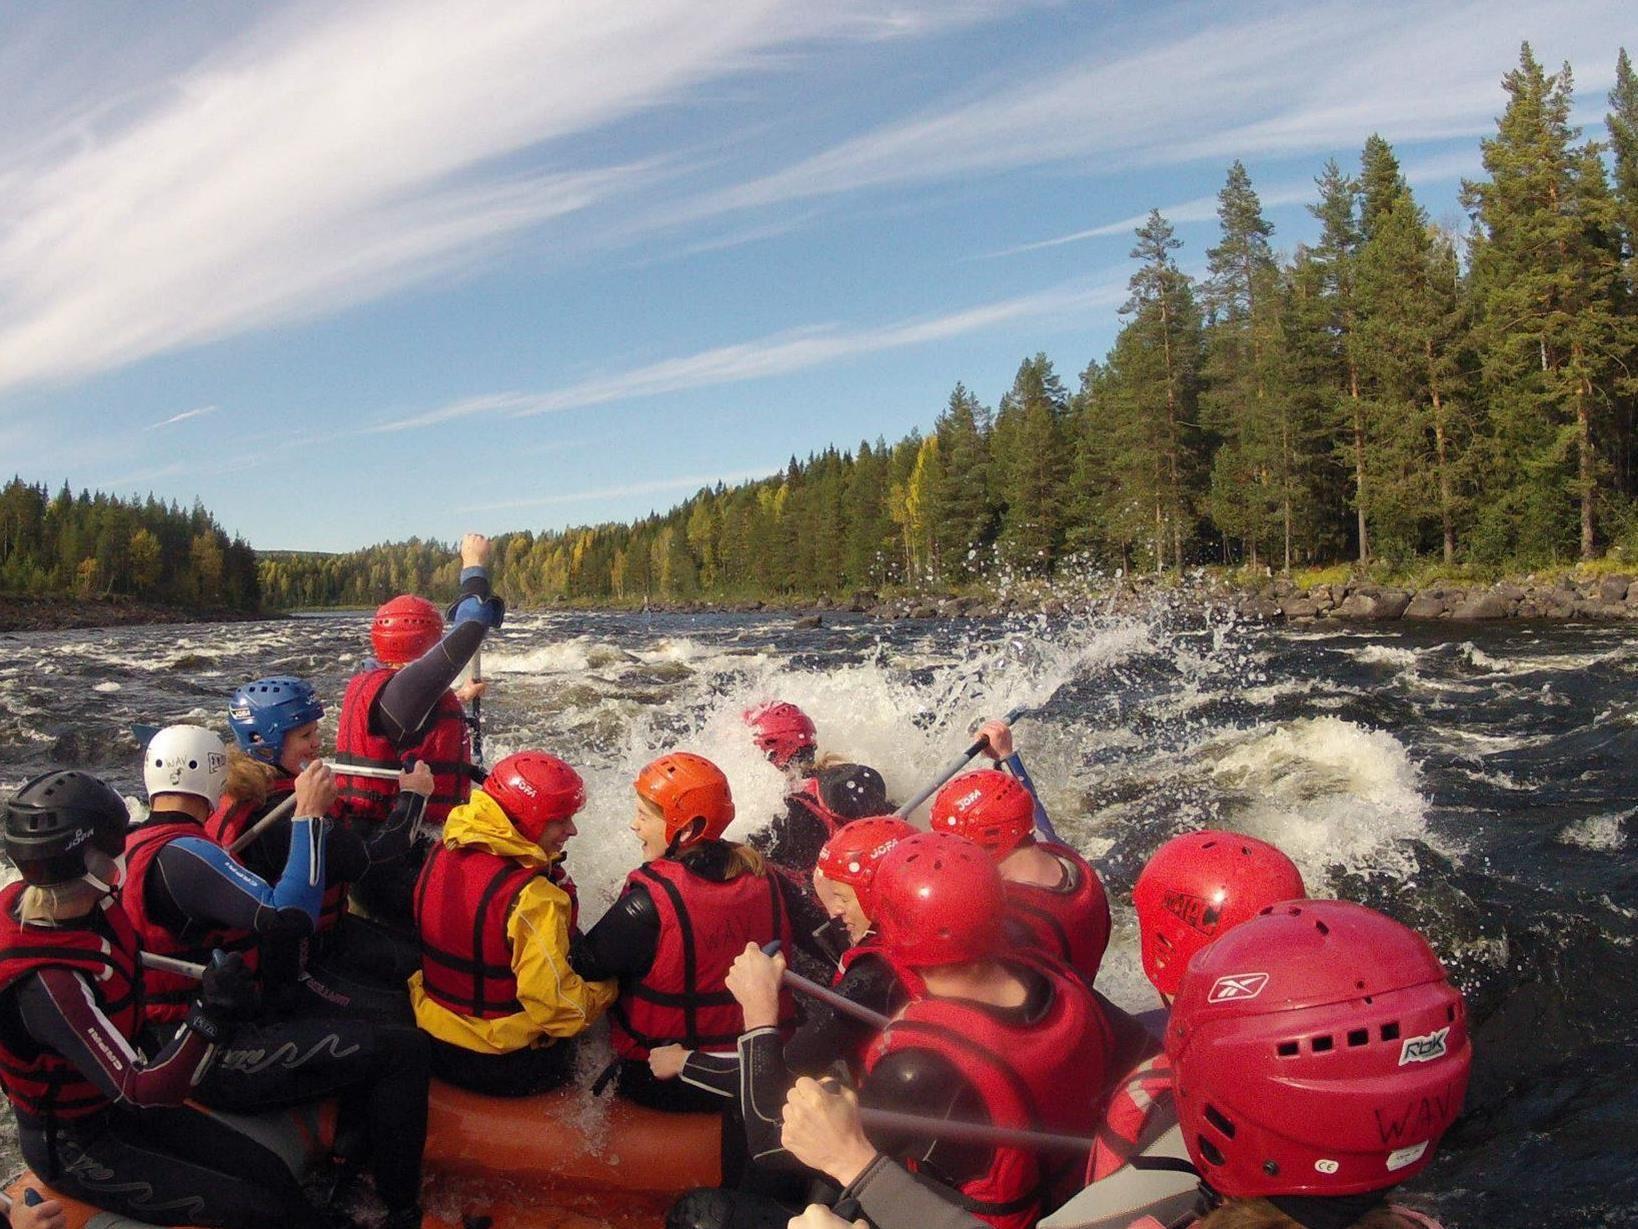 Janne Norén,  © Wilderness Adventure, Forsränning i Vindeälven